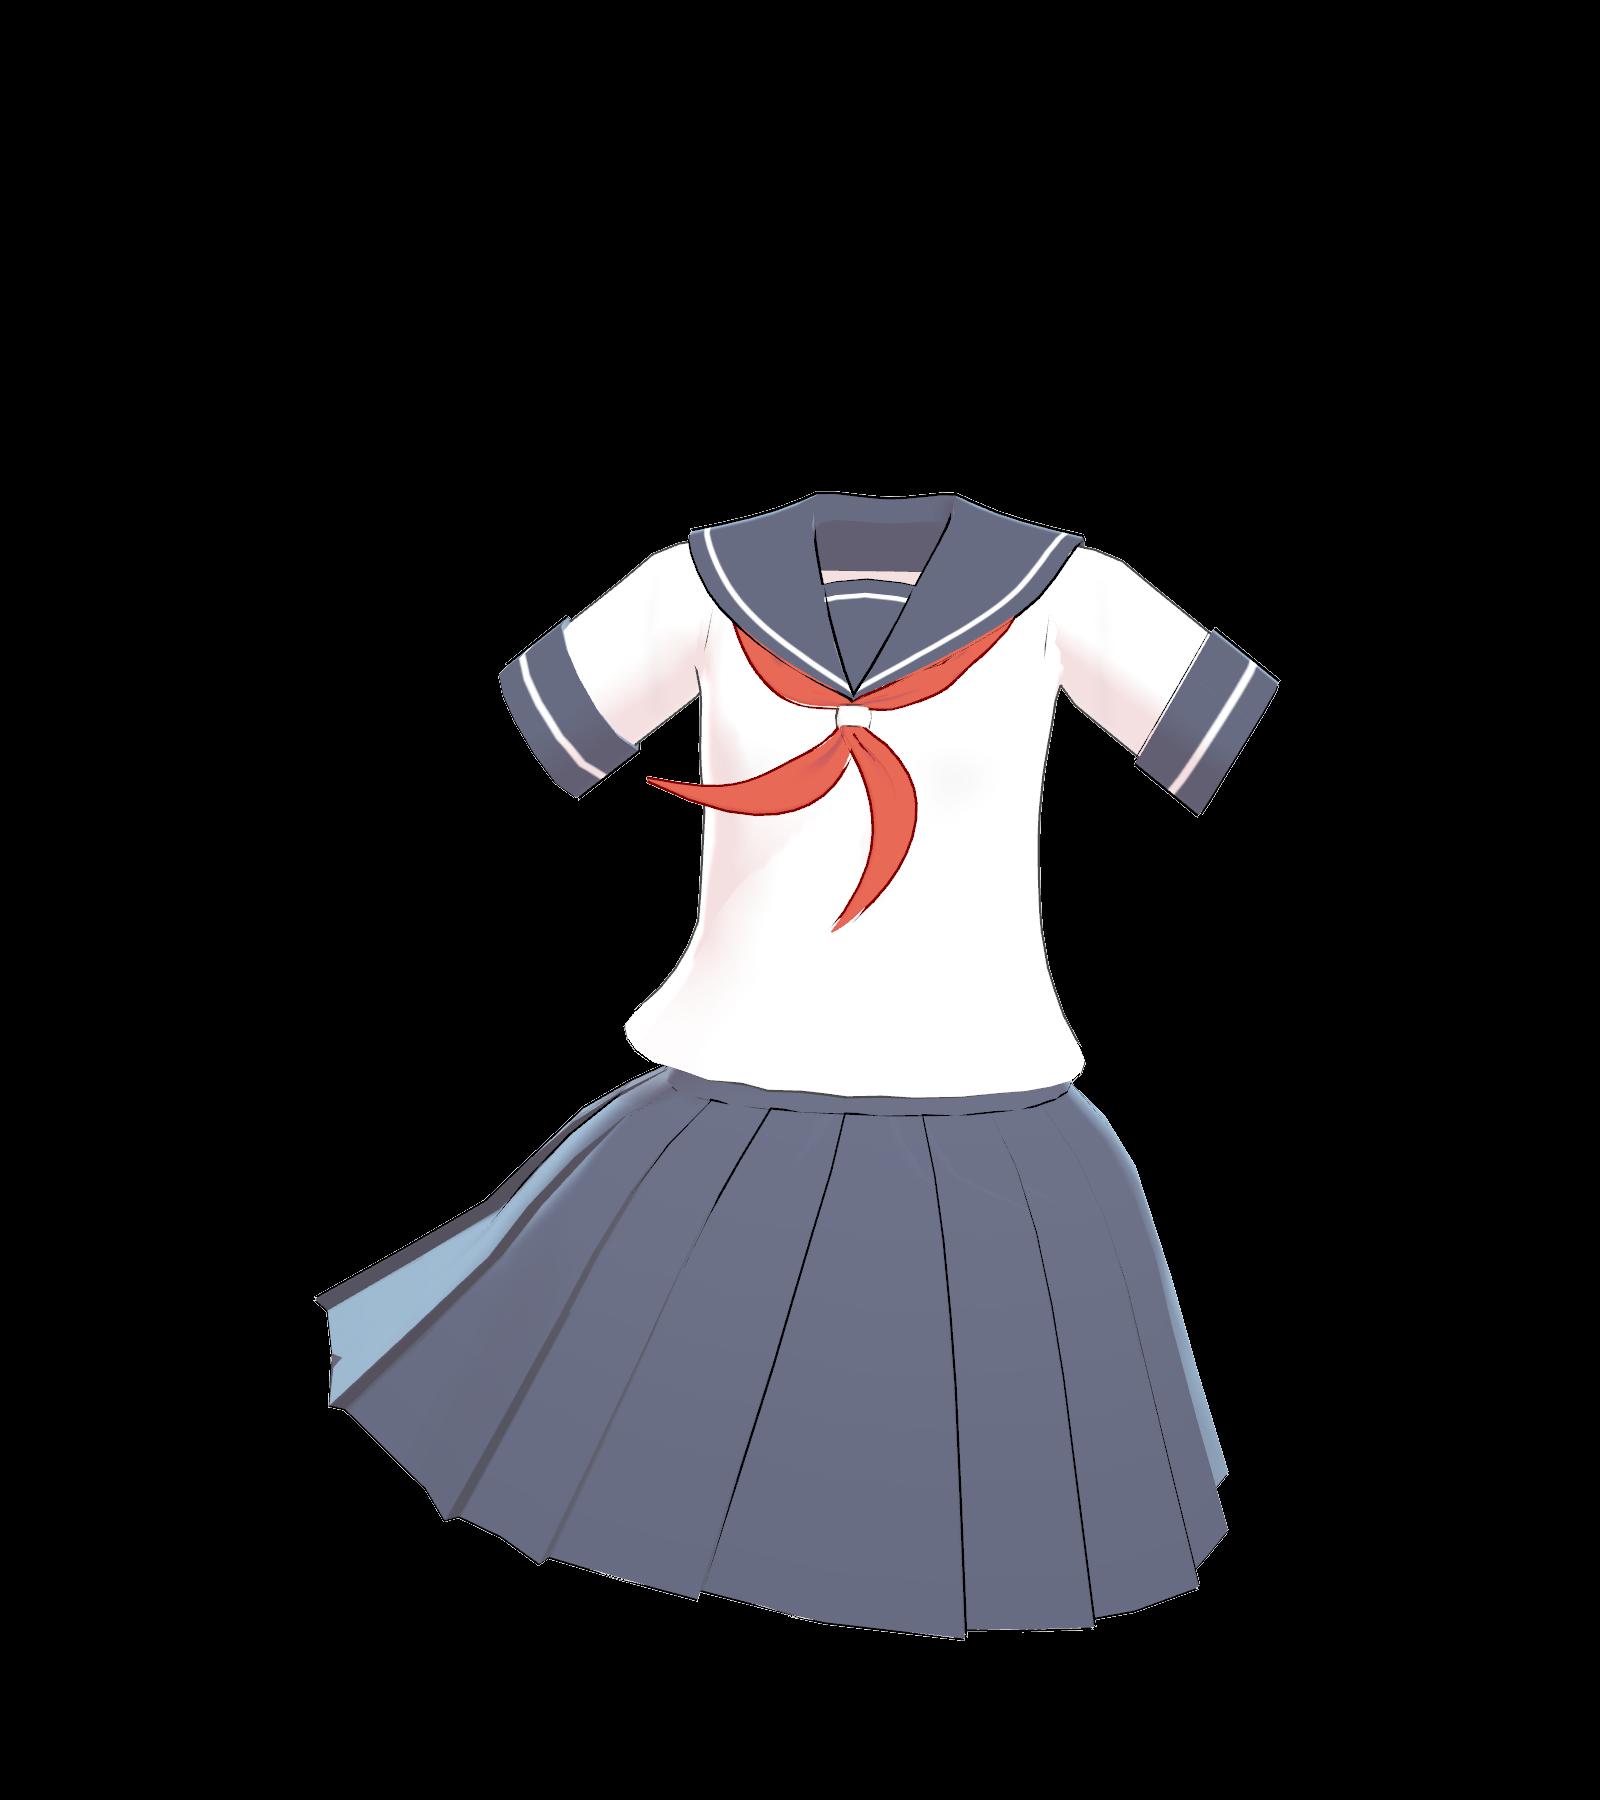 Summer School Uniform DL